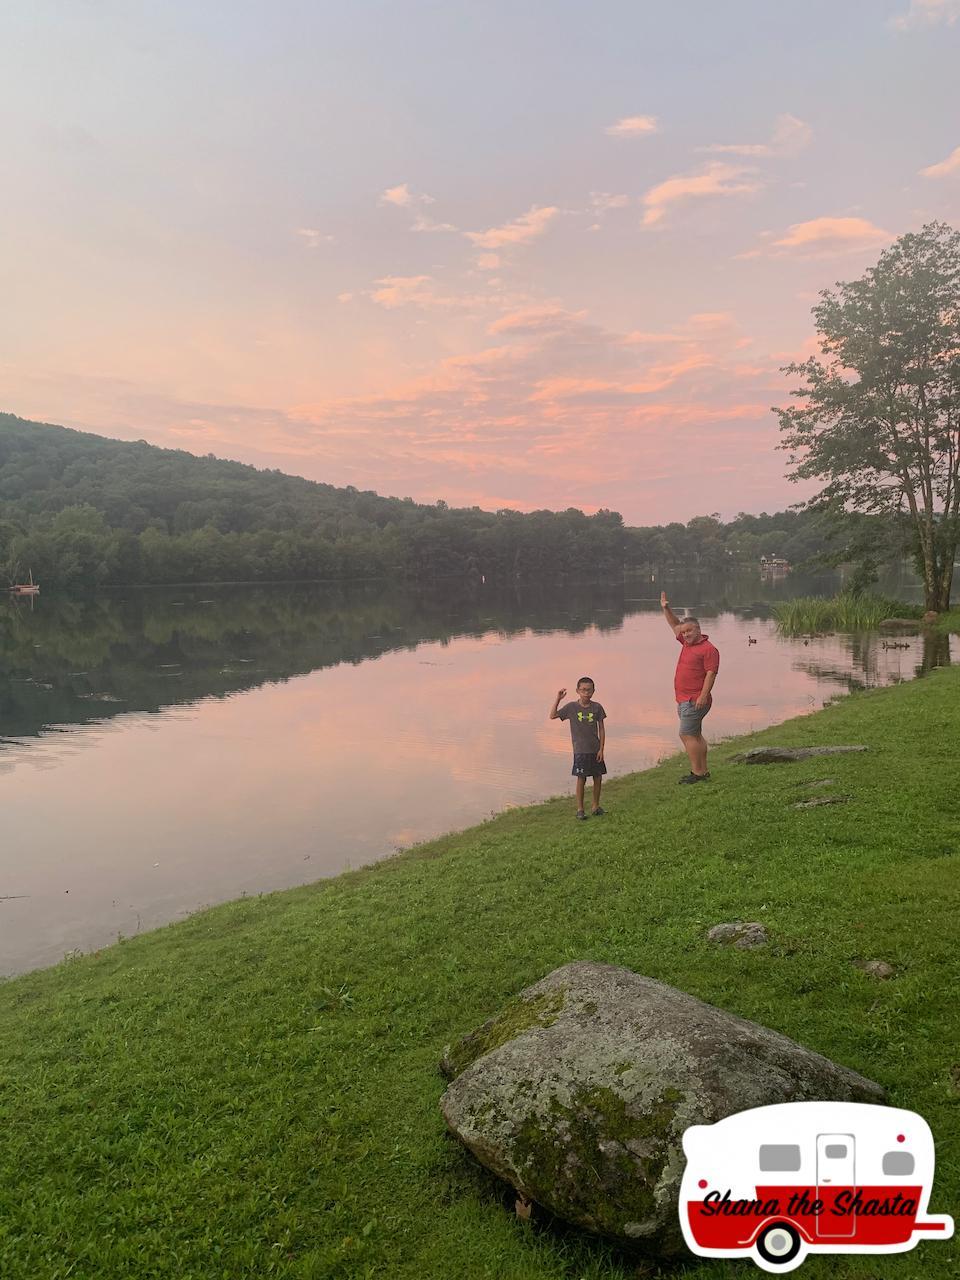 Sunset-Reflection-at-Lake-Waramaug